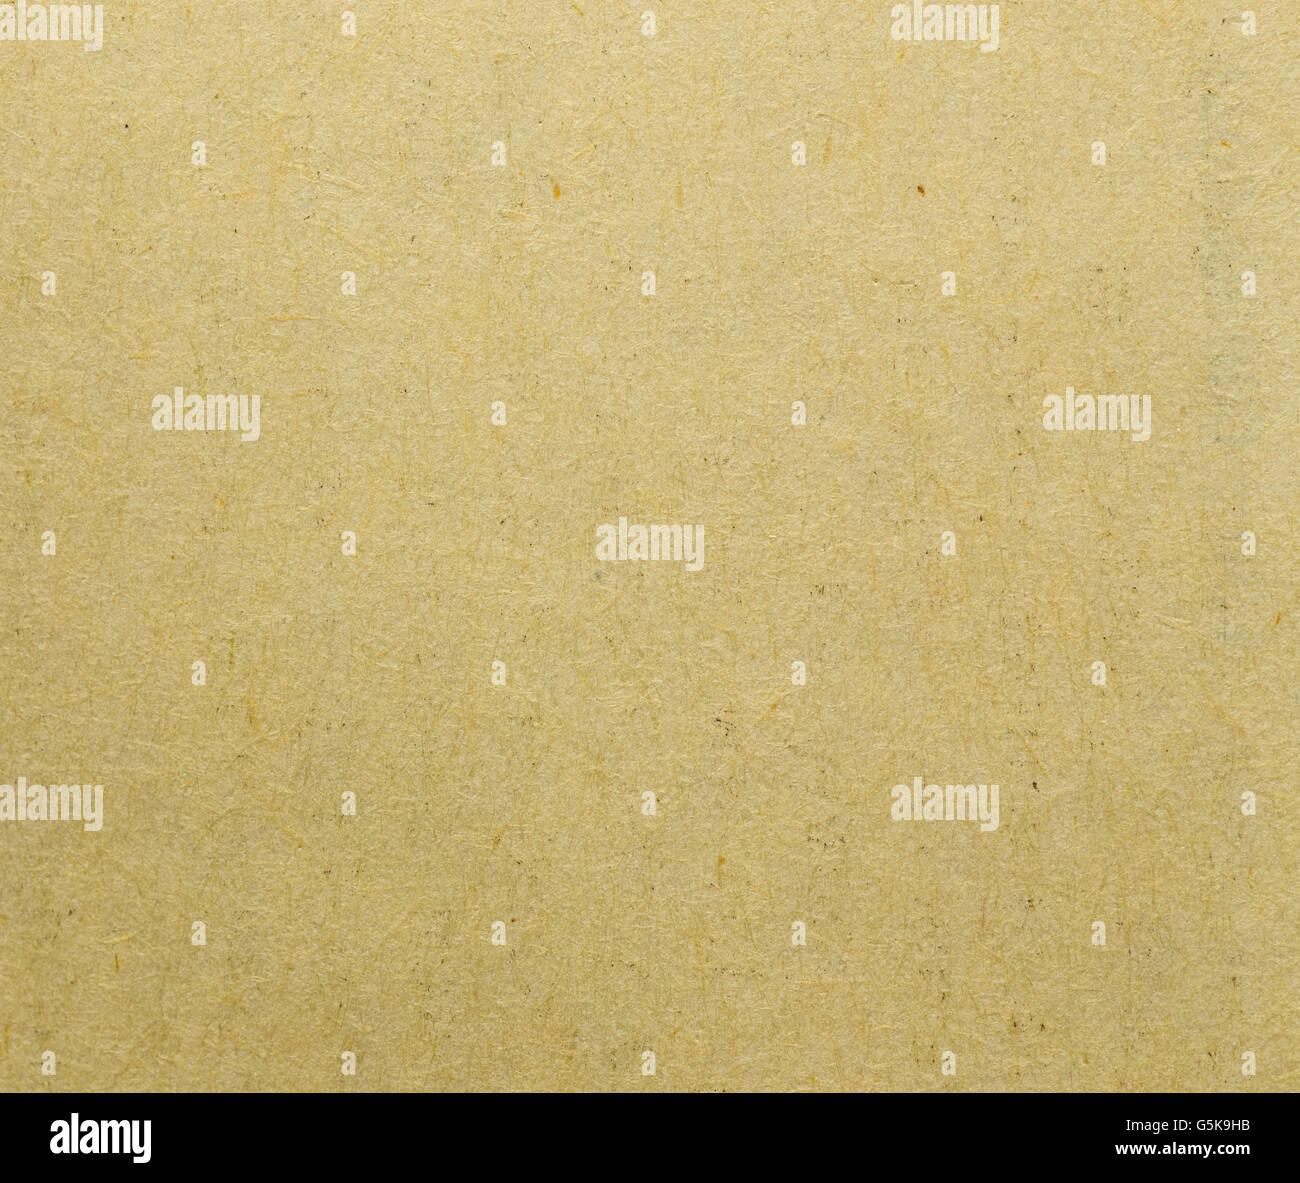 Vintage paper texture background - Stock Image